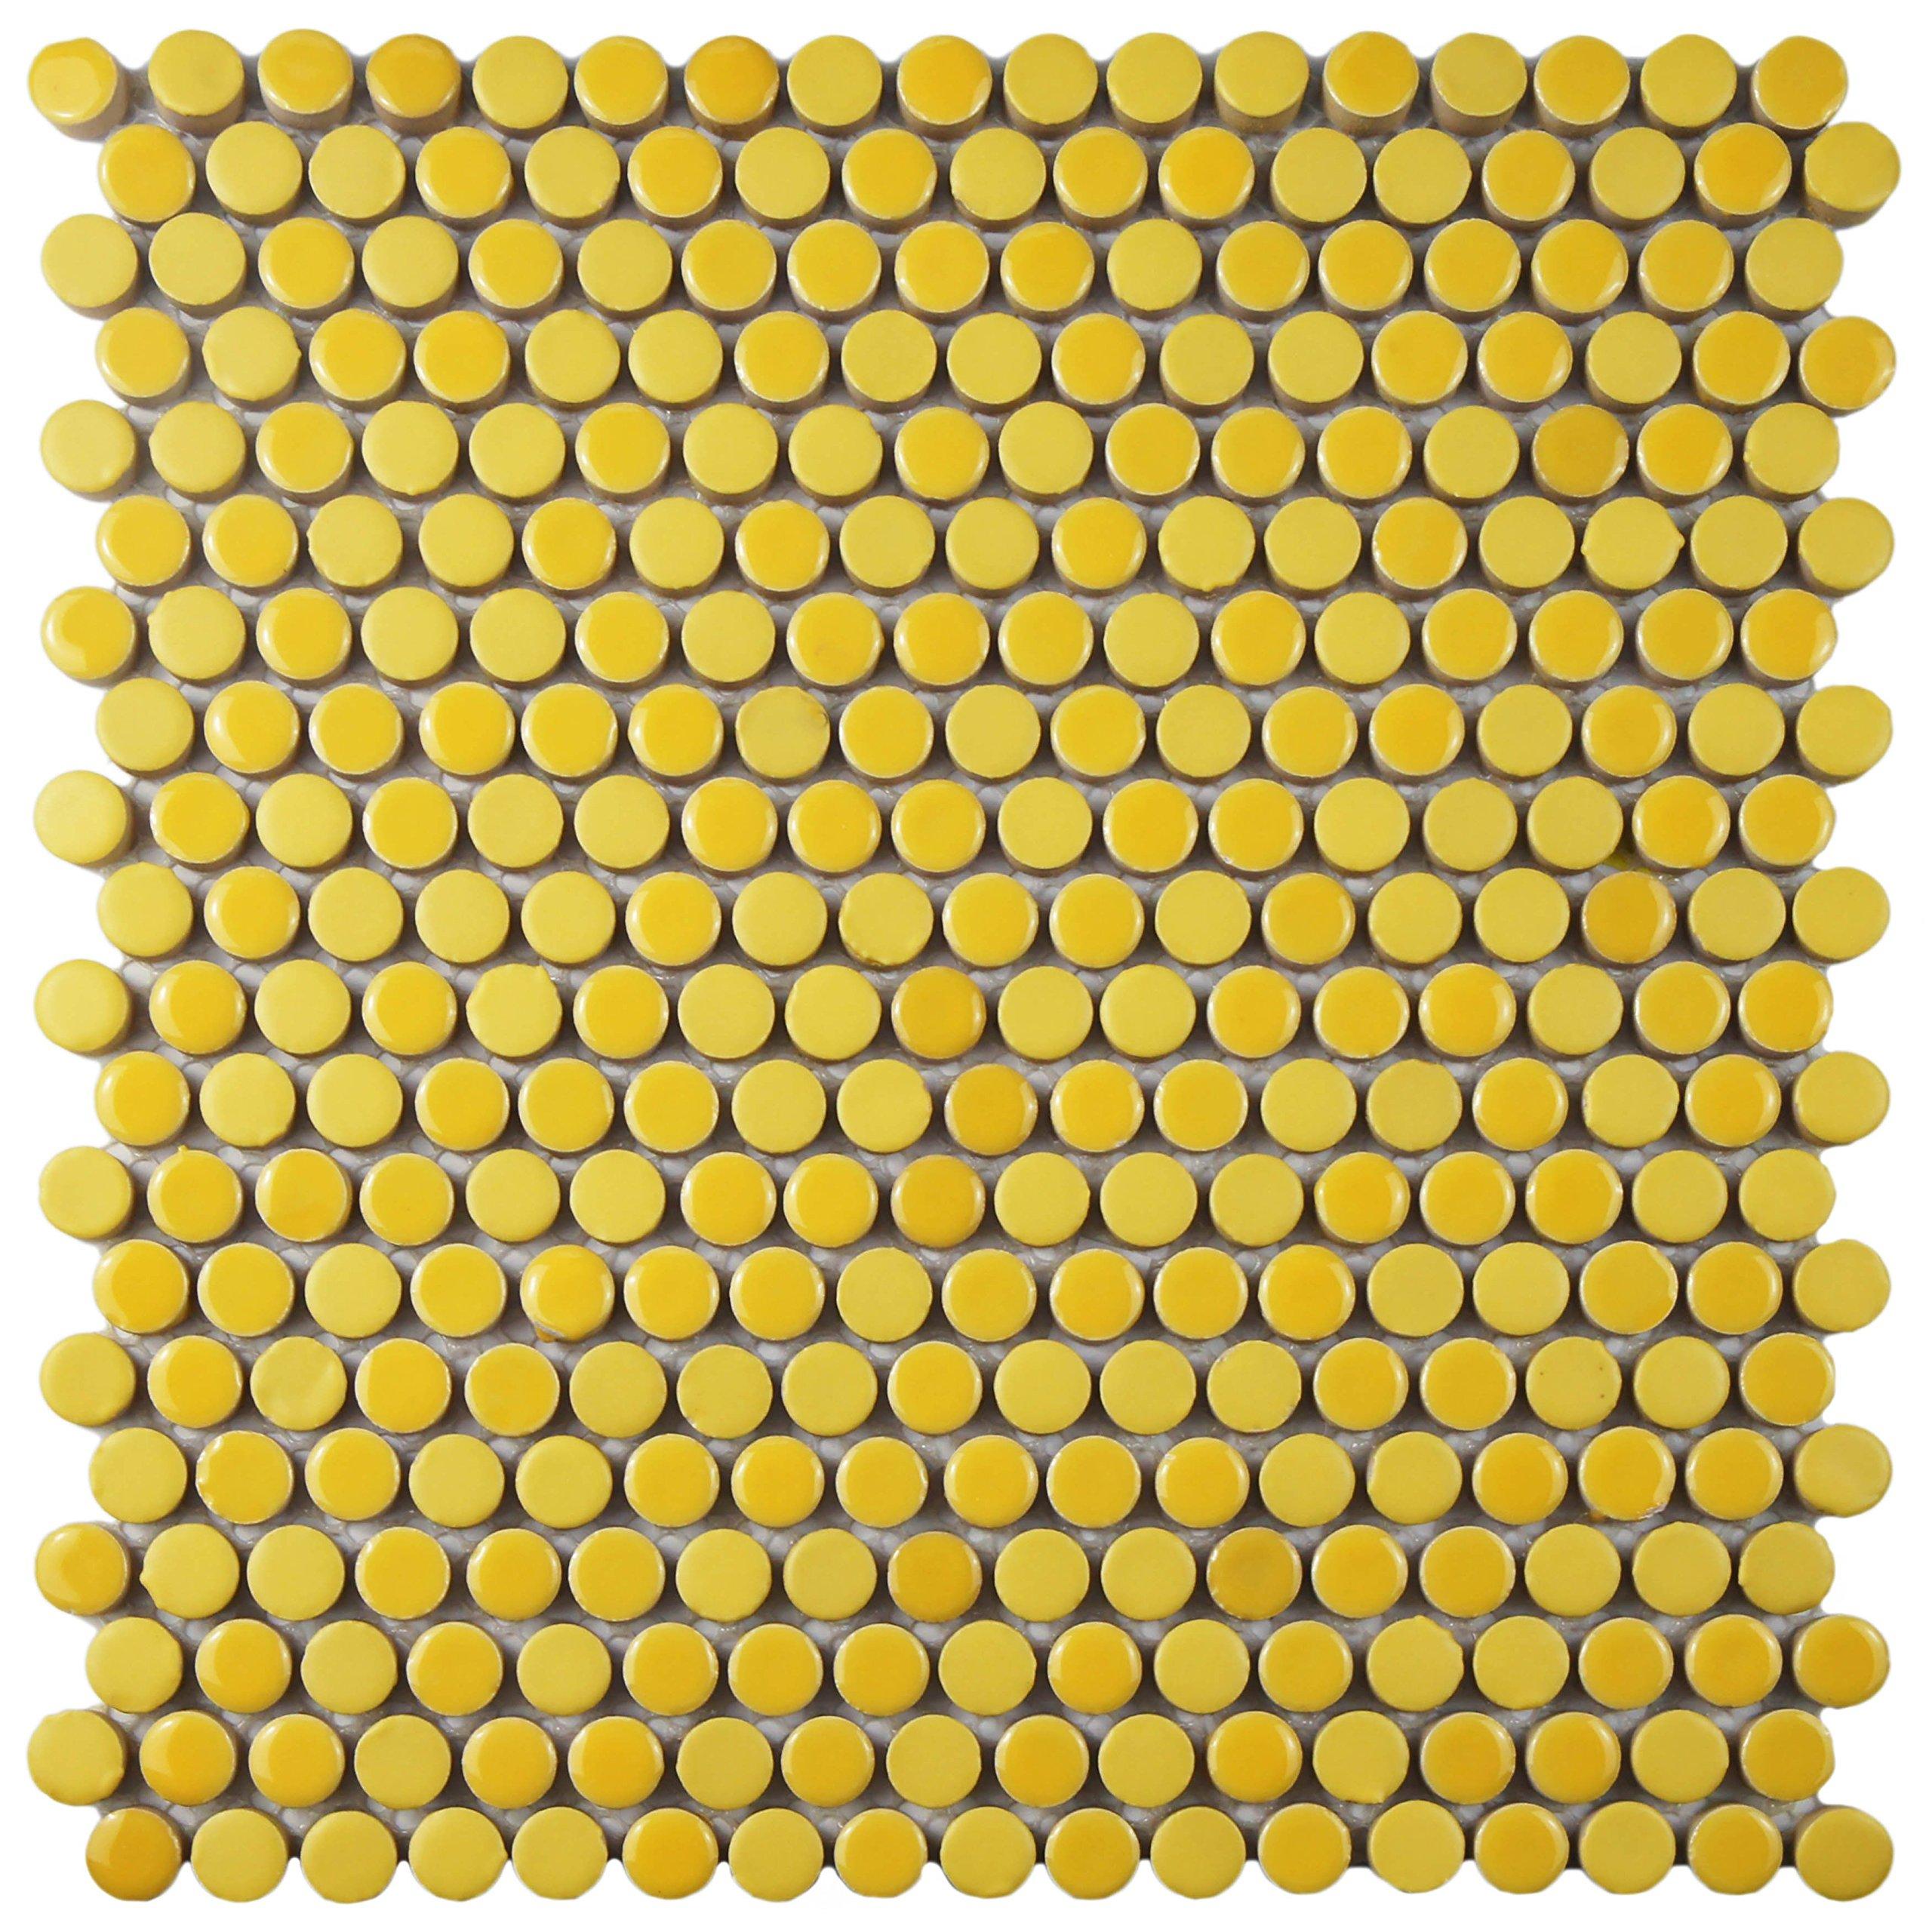 SomerTile FSHCOMYL Juno Penny Round Porcelain Floor and Wall Tile, 11.25'' x 11.75'', Yellow